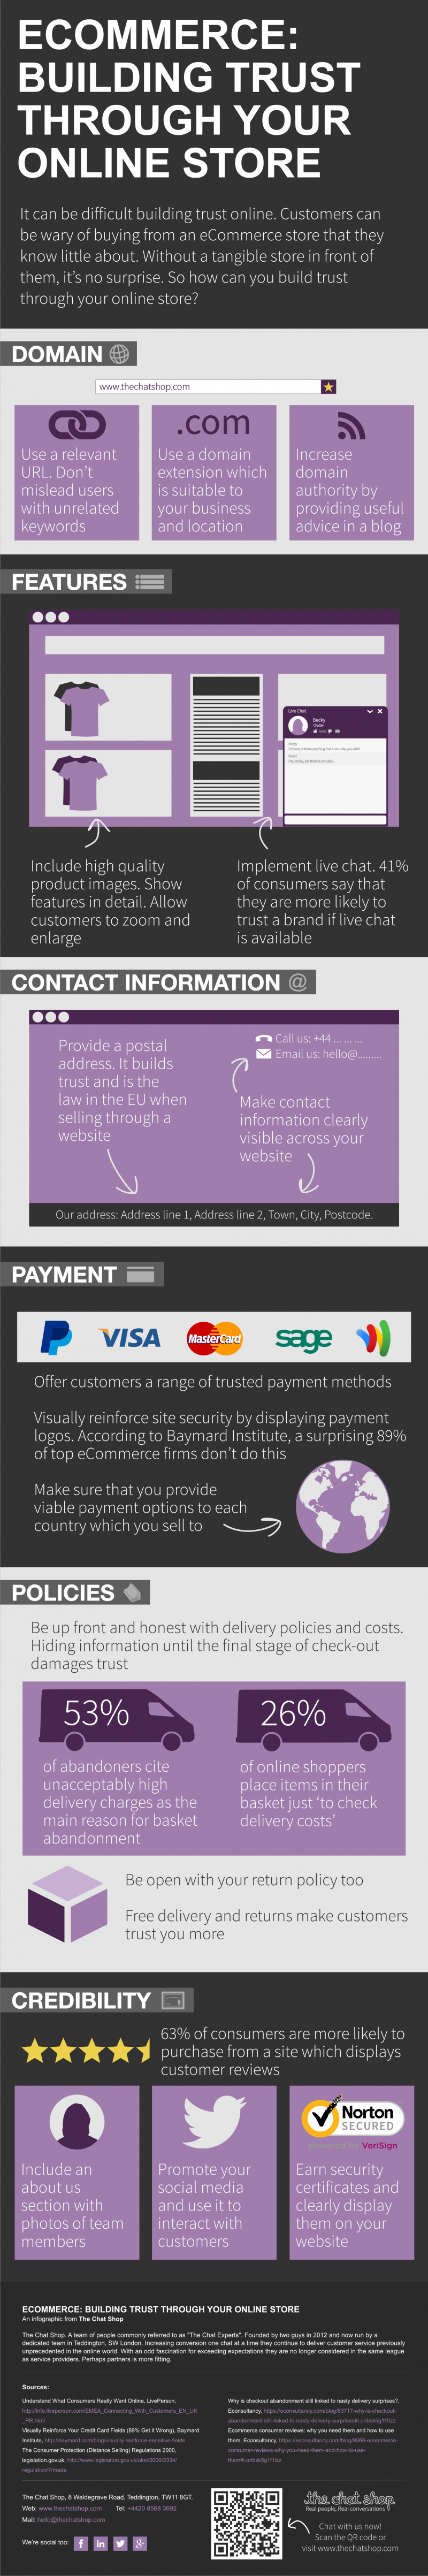 Ecommerce Building Trust Infographic